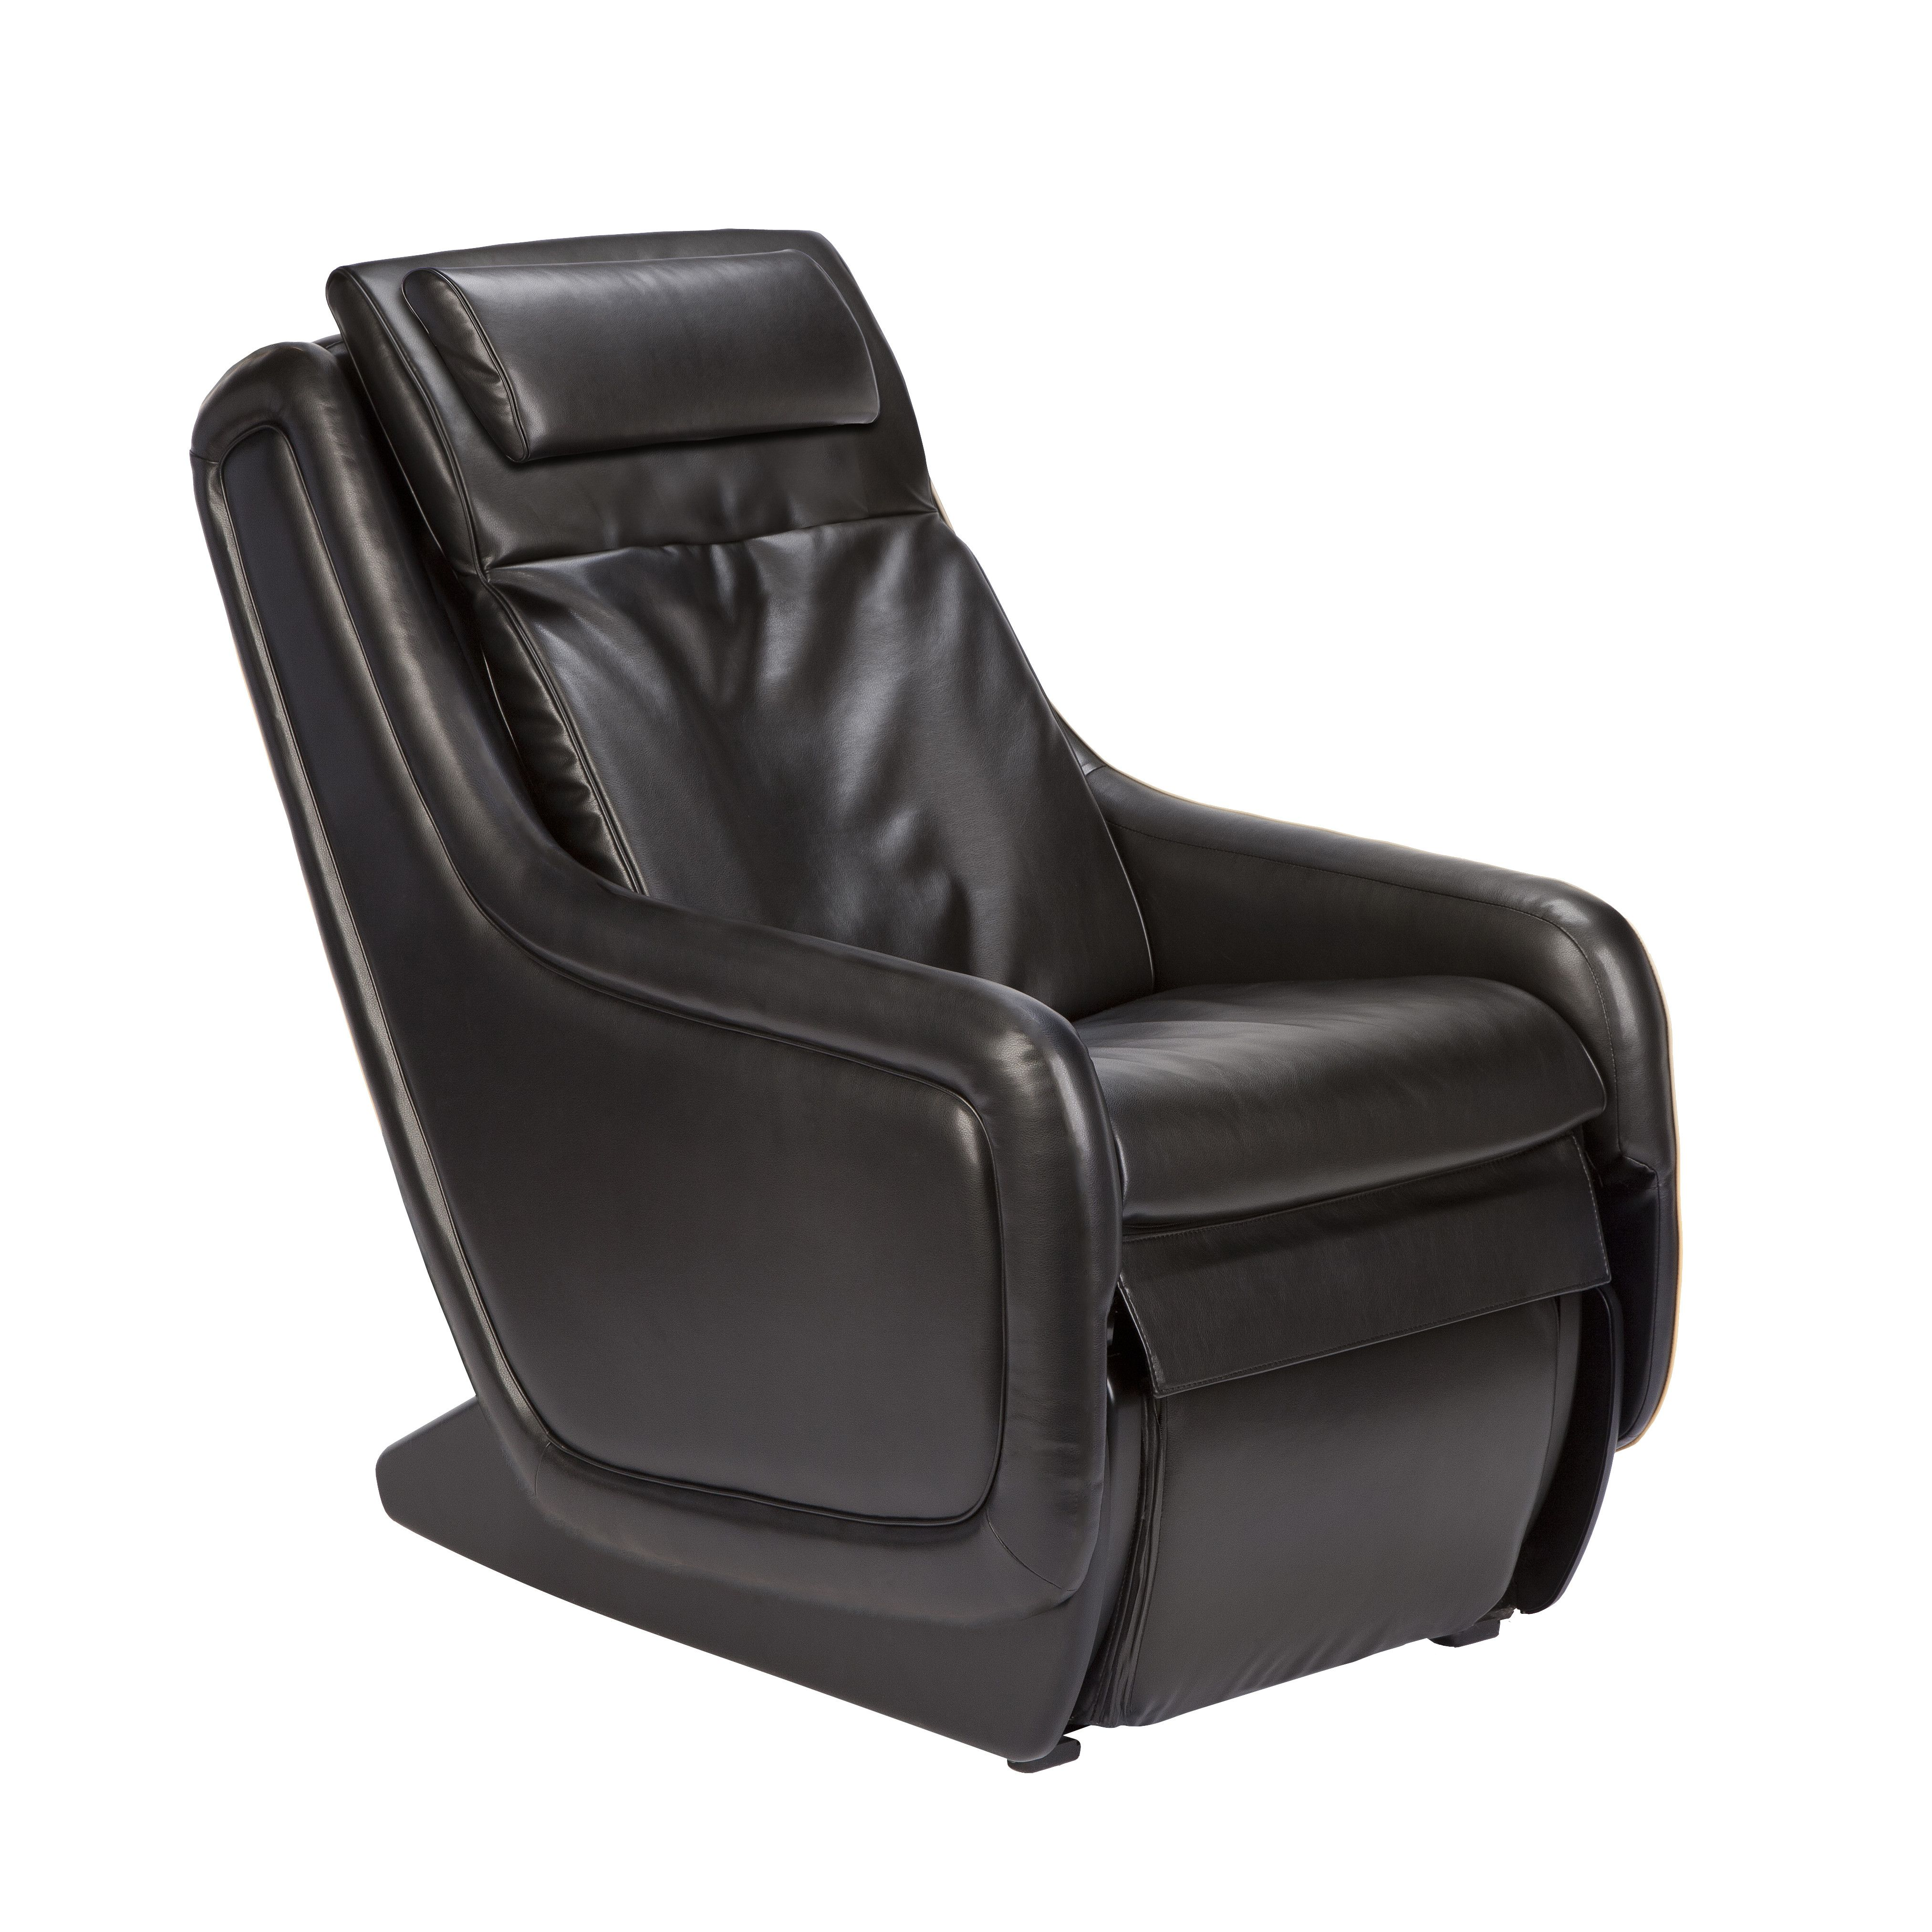 Human Touch Zerog 2 0 Zero Gravity Massage Chair Reviews Wayfair Massage Chair Massage Chairs Comfy Leather Chair